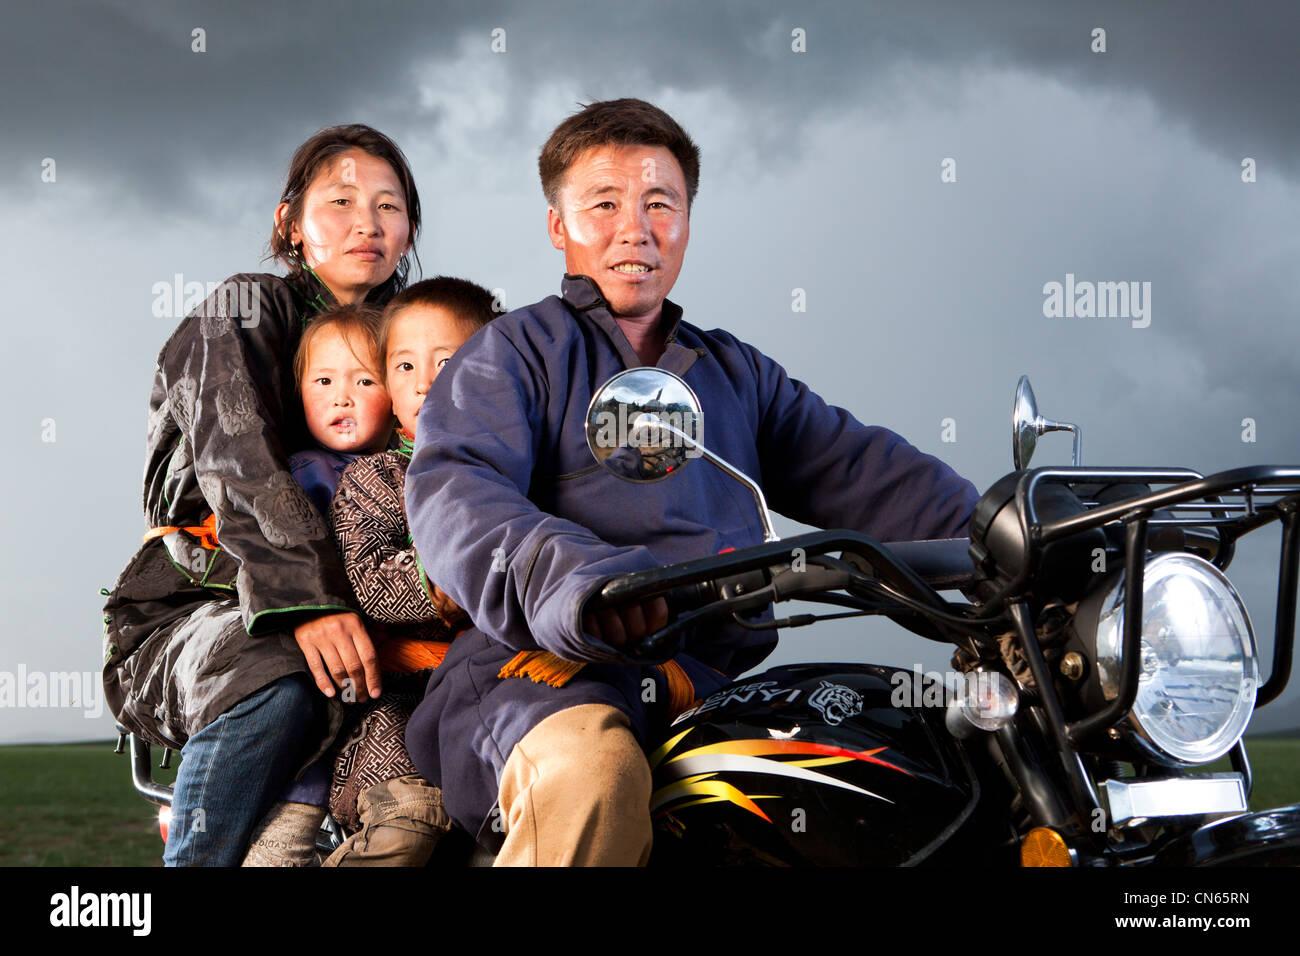 Mongolian family on the motorbike, khuduu aral, khentii province, Mongolia - Stock Image